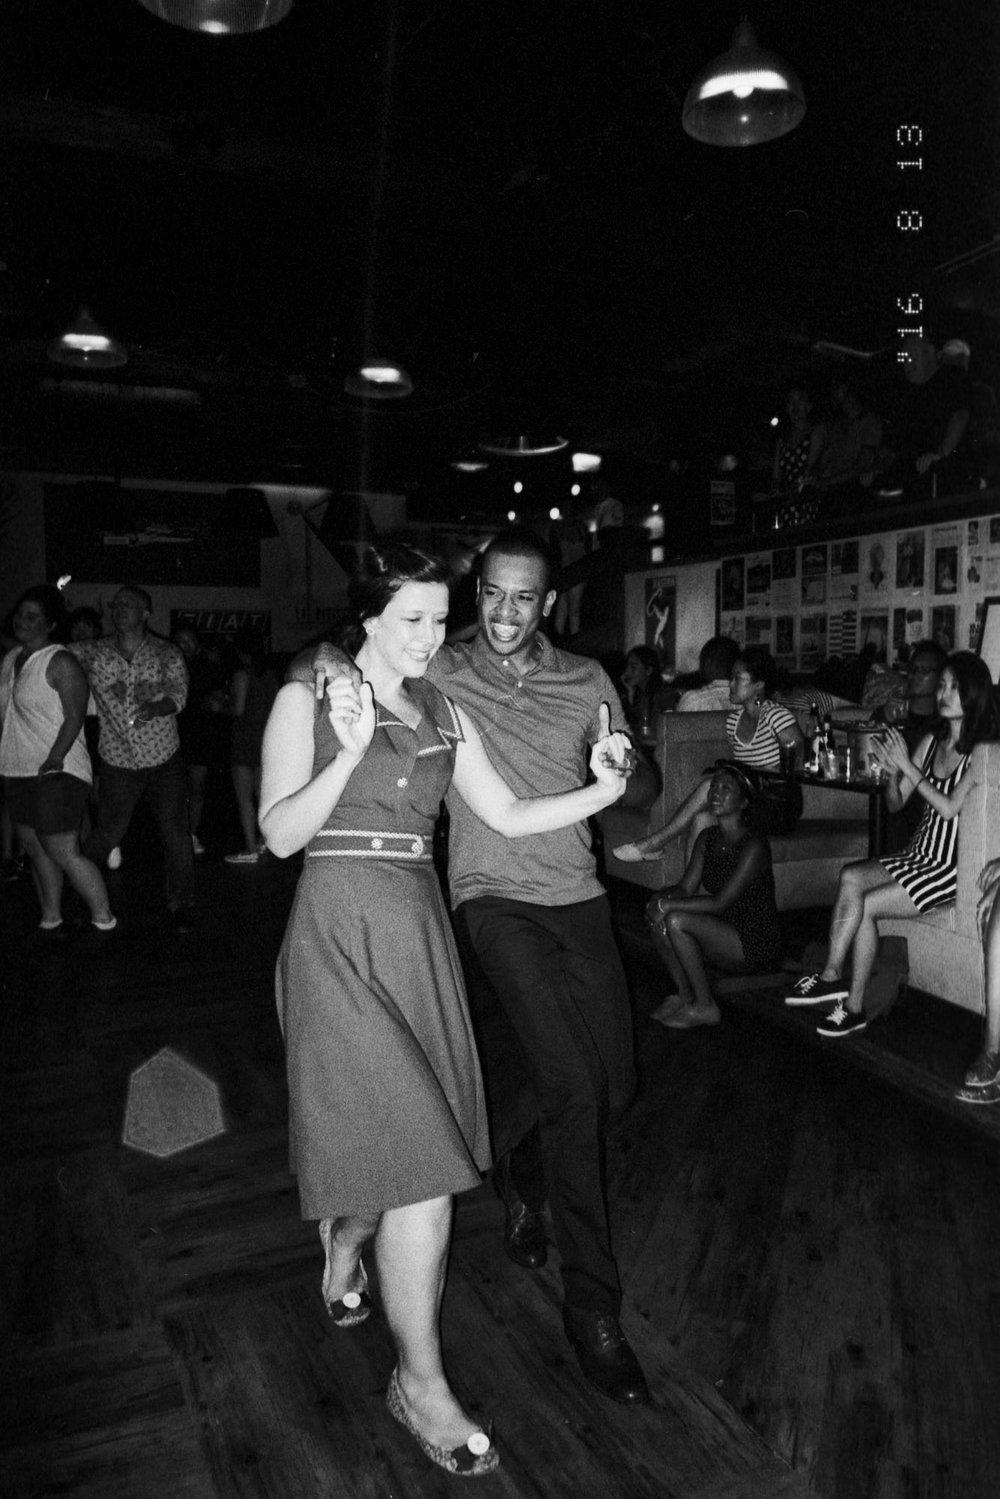 Rockabilly Swing and Dance. Hong Kong. 2016